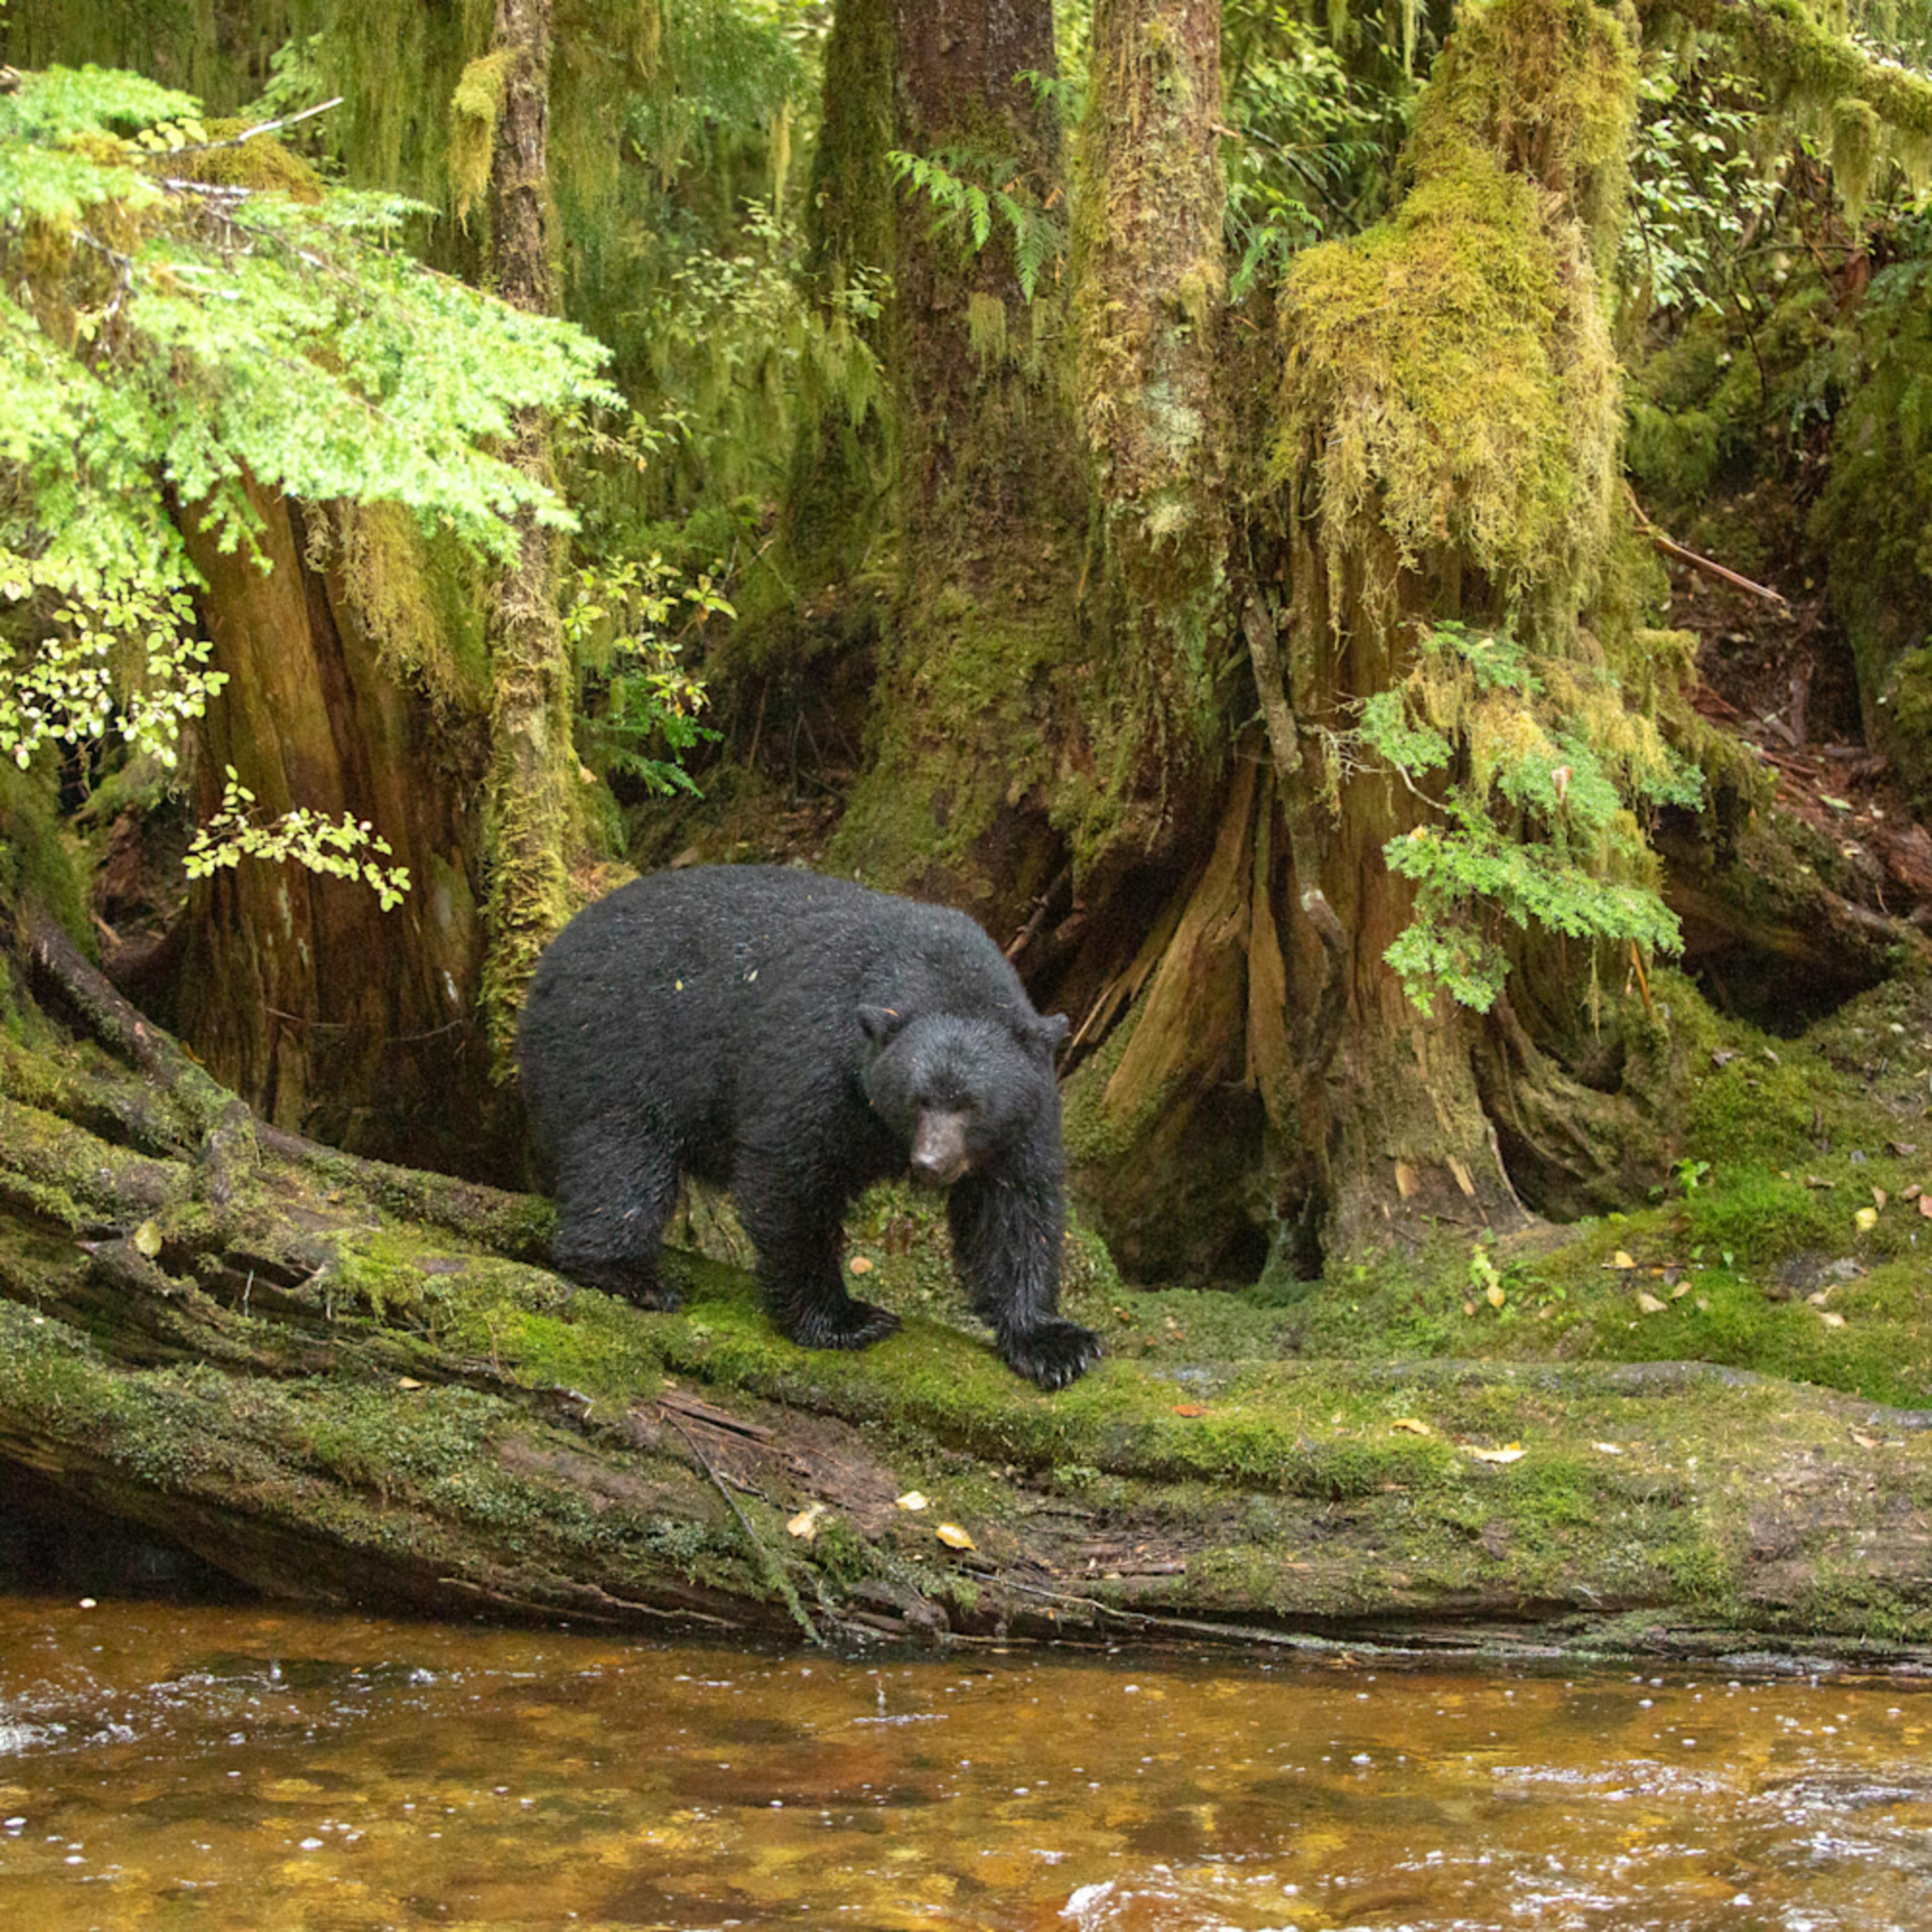 Great bear rainforest october 08 201802125 xtffx4